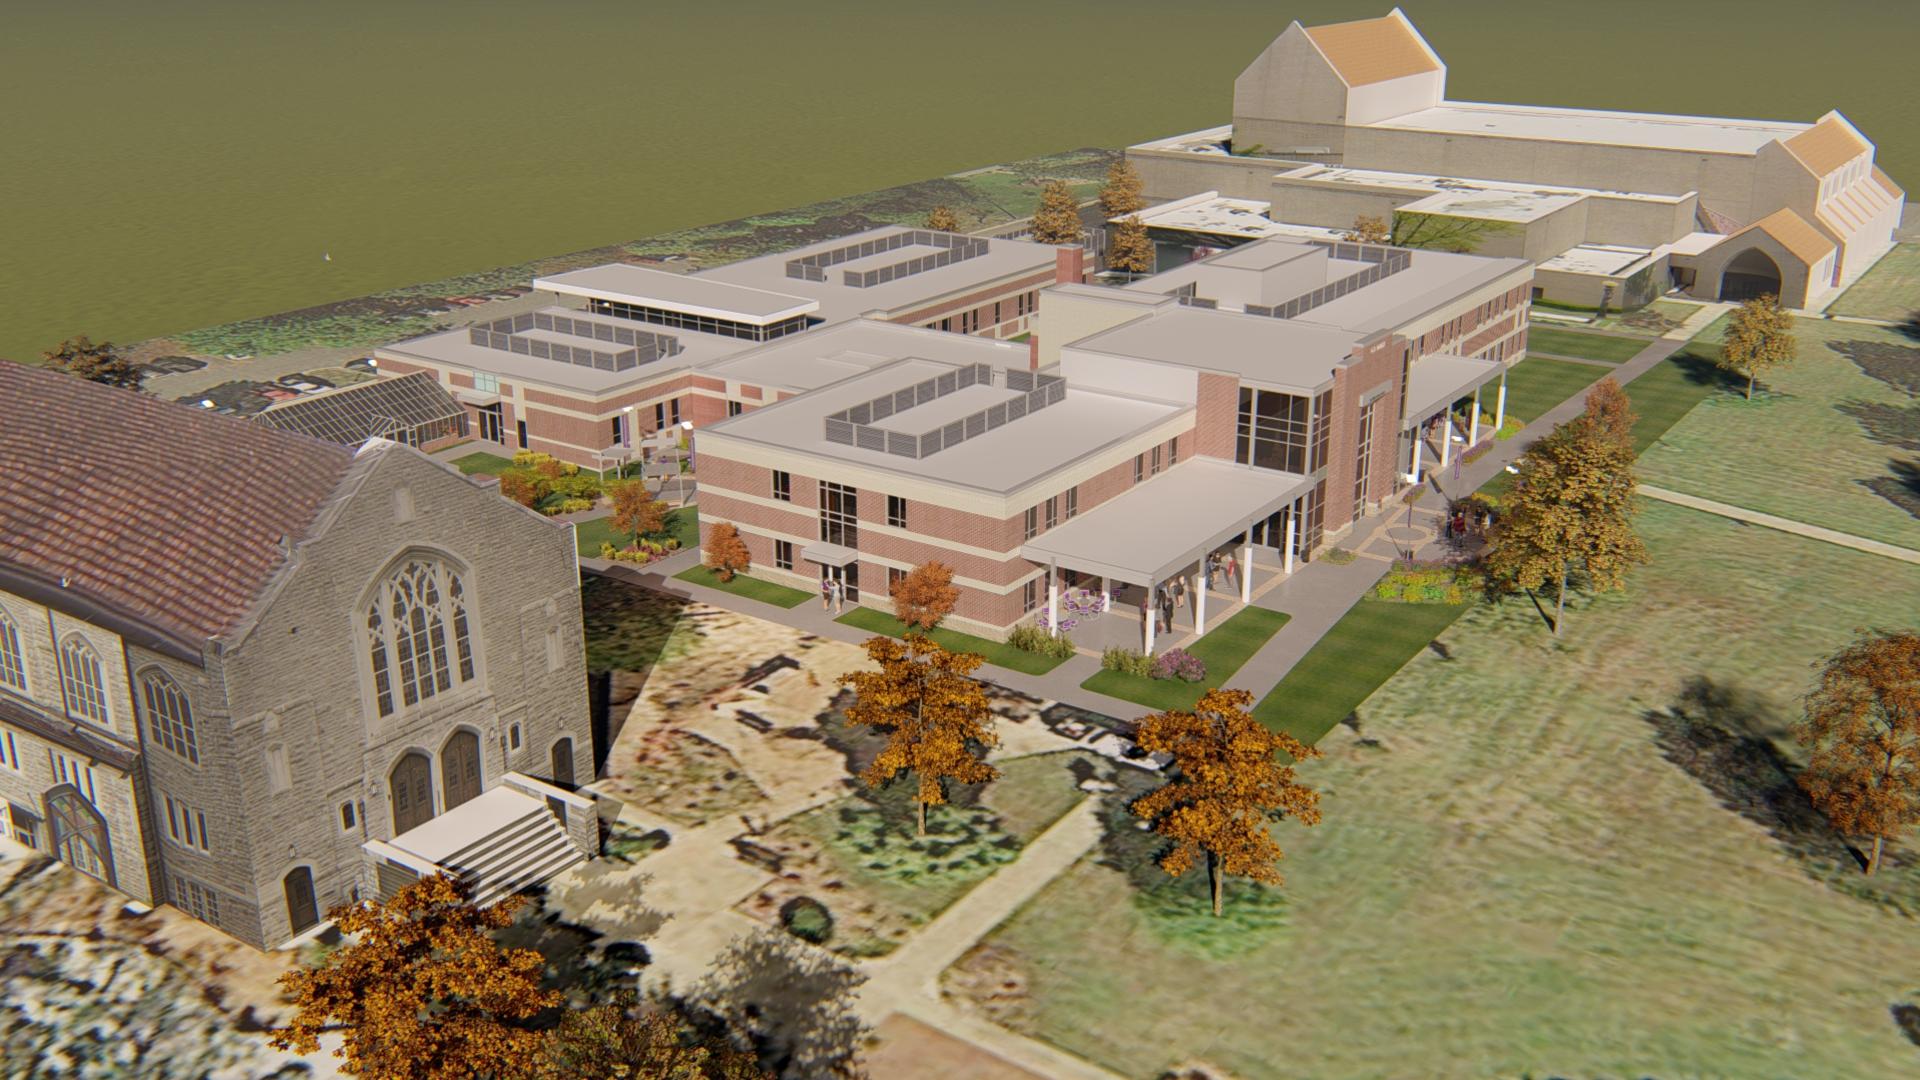 Ozarks Science Building__19 - Photo